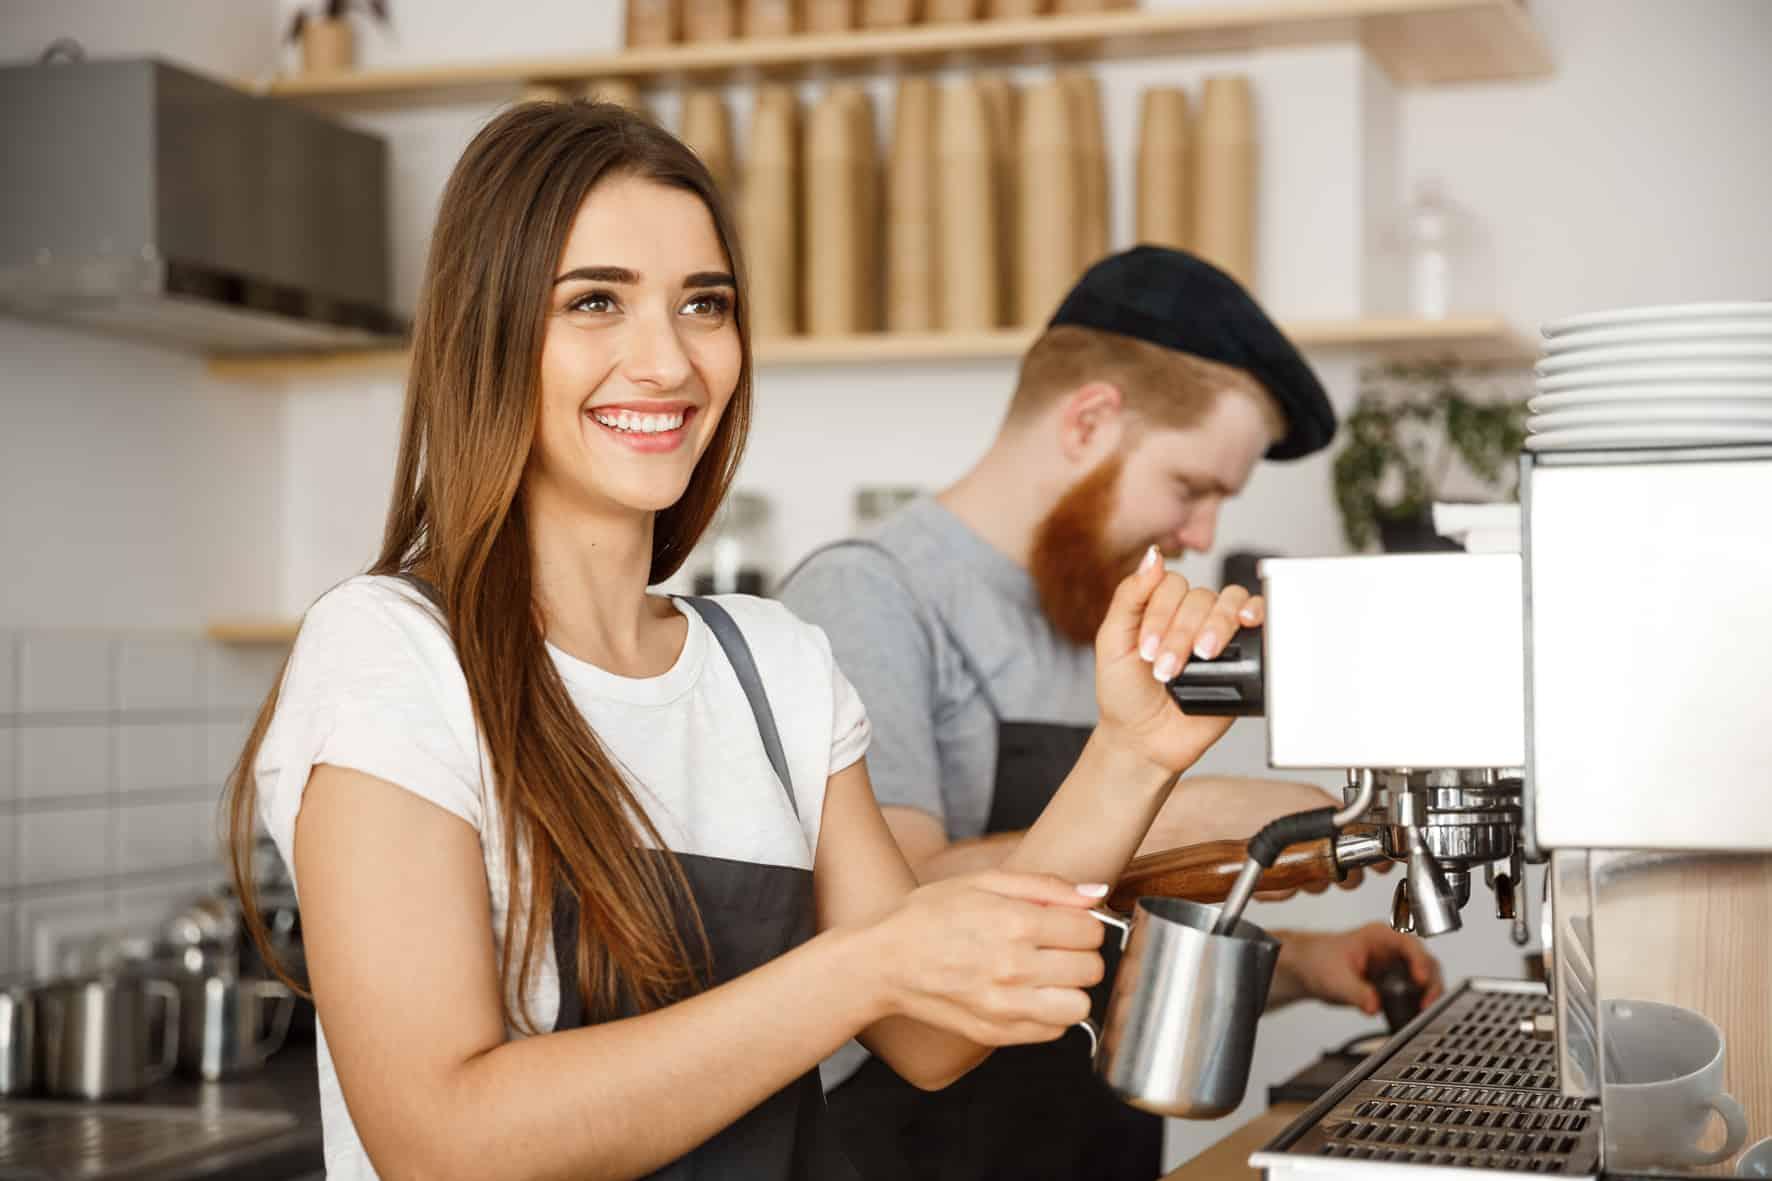 Studentin bekommt BAföG bei ihrem Nebenjob im Cafe